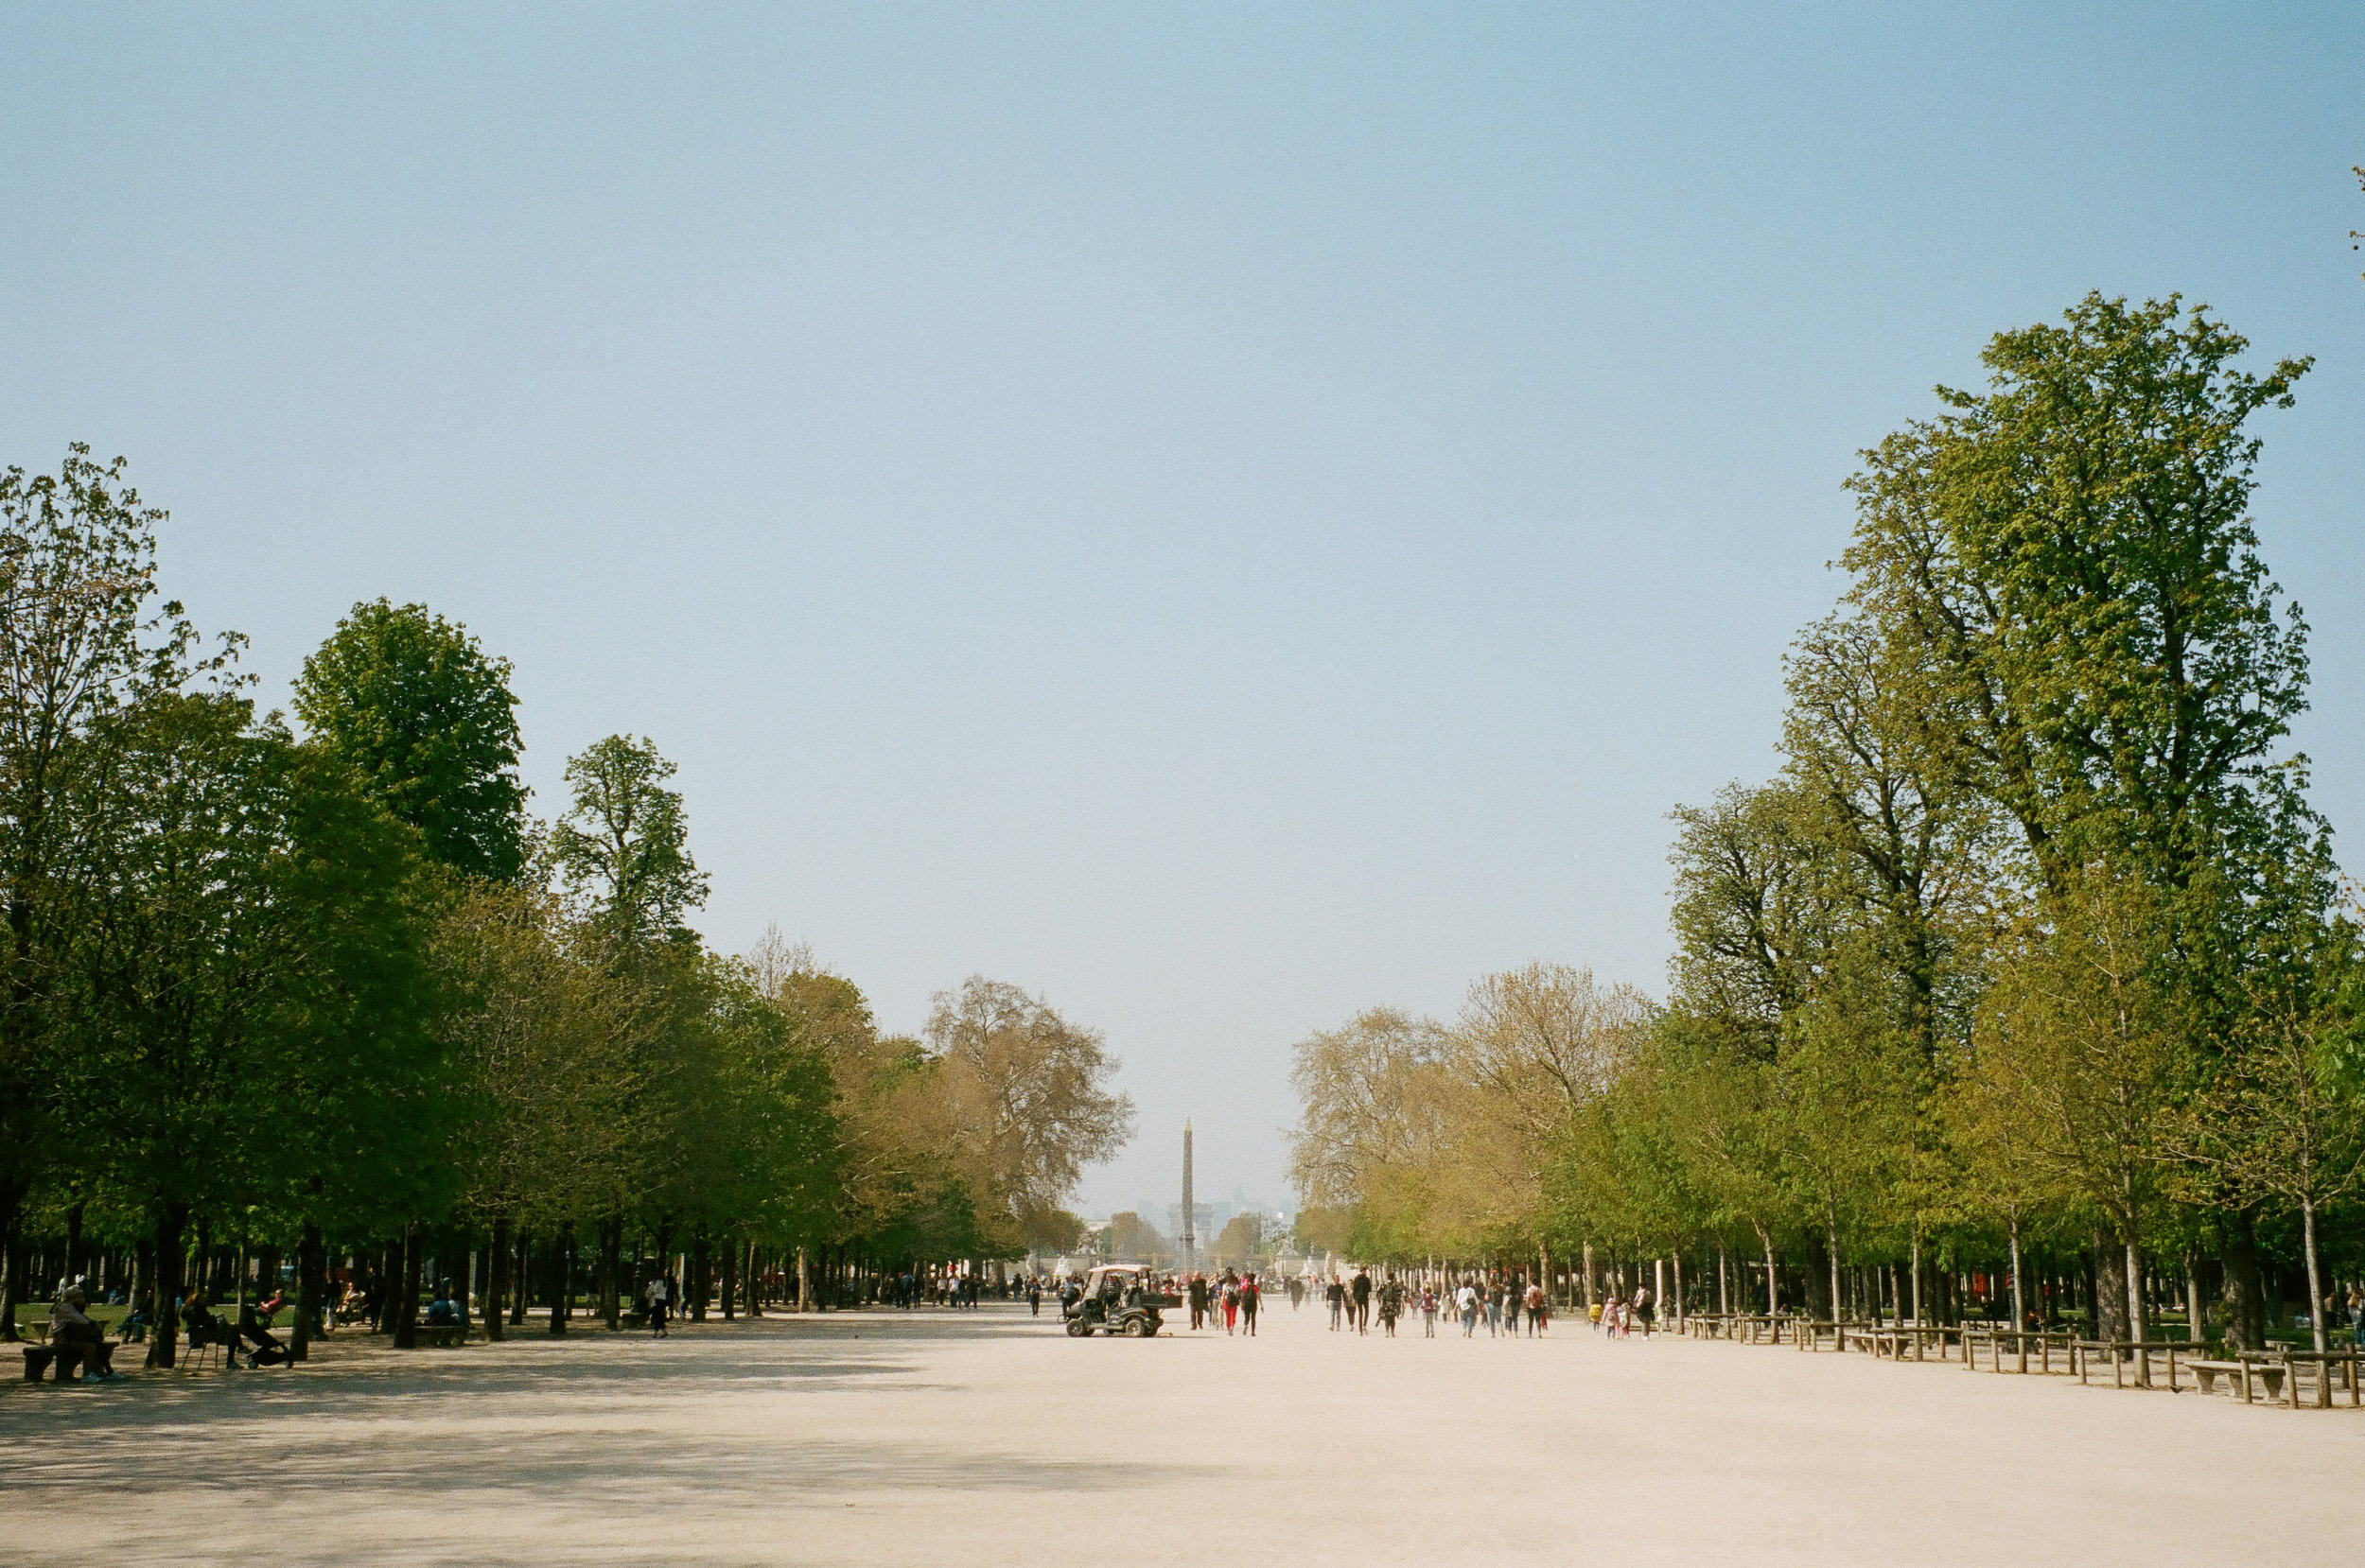 LeicaM6042019-1009.jpg